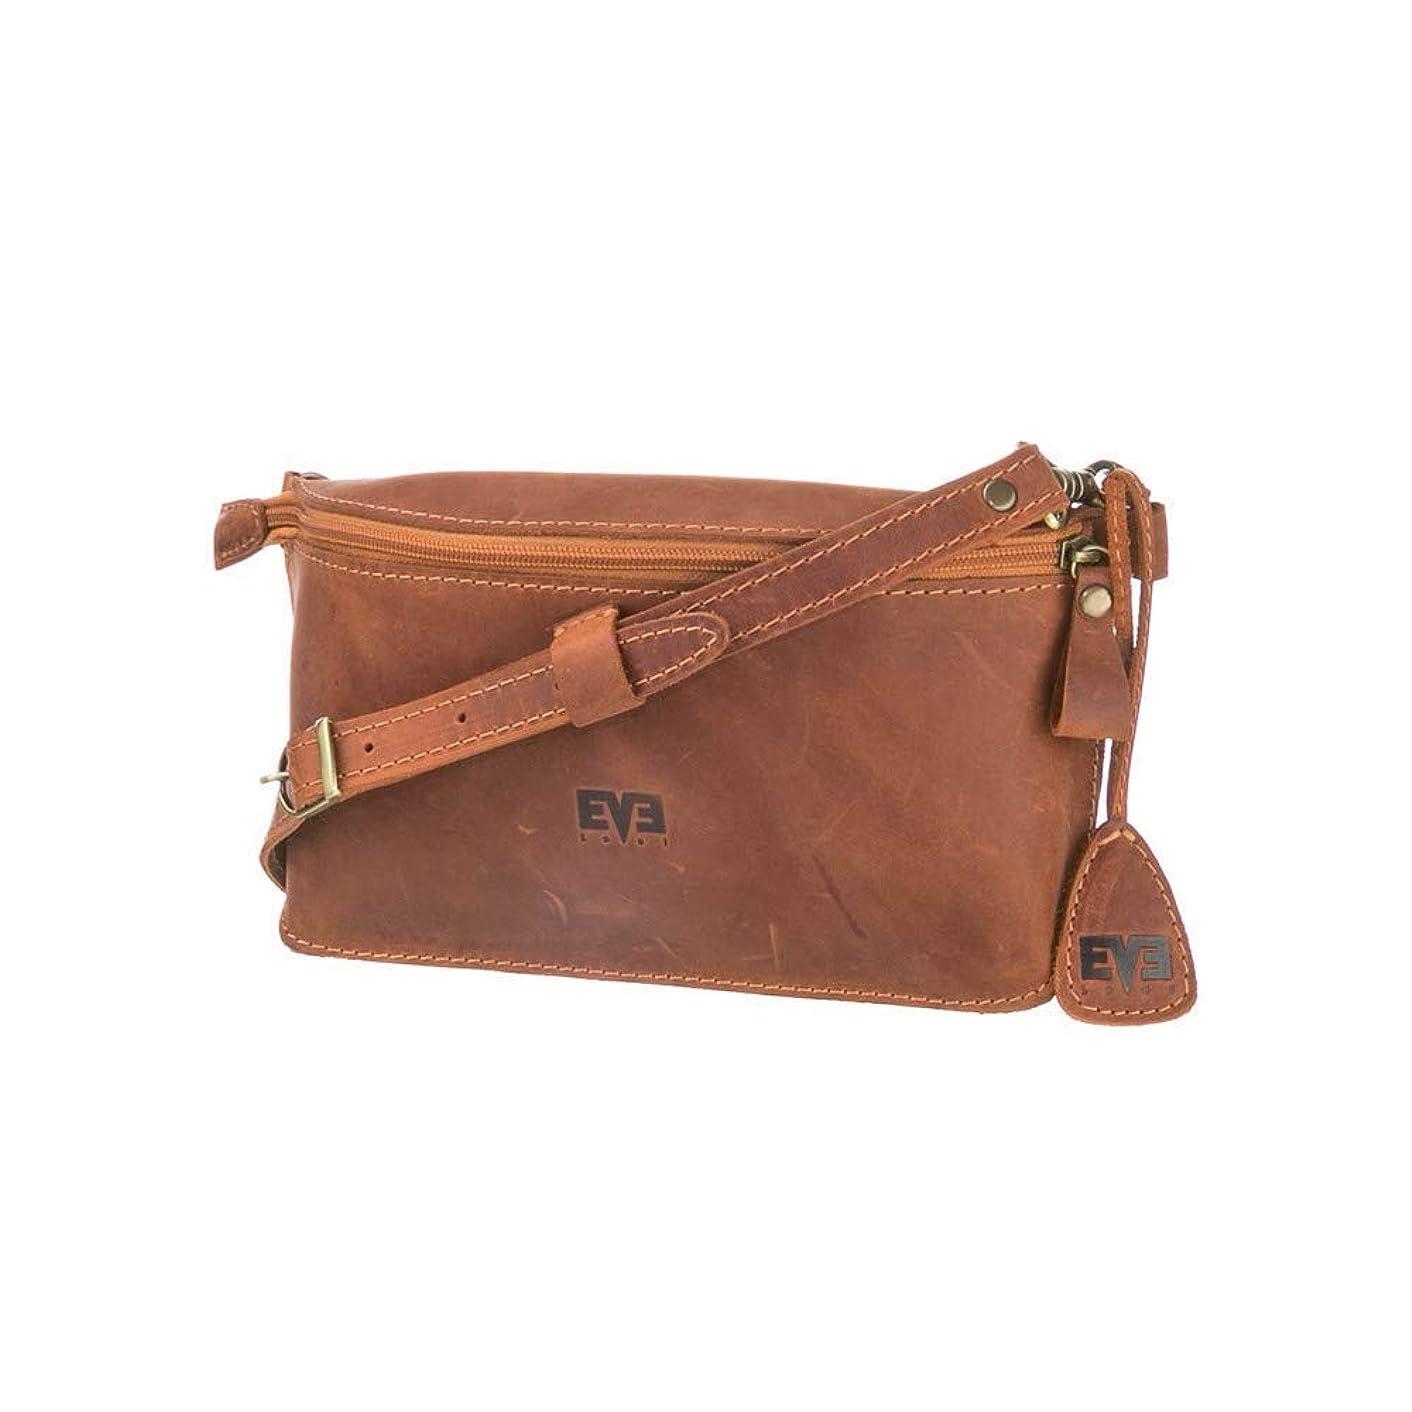 Leather Fanny Pack Belt Bag Leather Bum Waist Pack Hip Pouch Festival Fanny Pack Vintage Crossbody Handmade Utility Belt